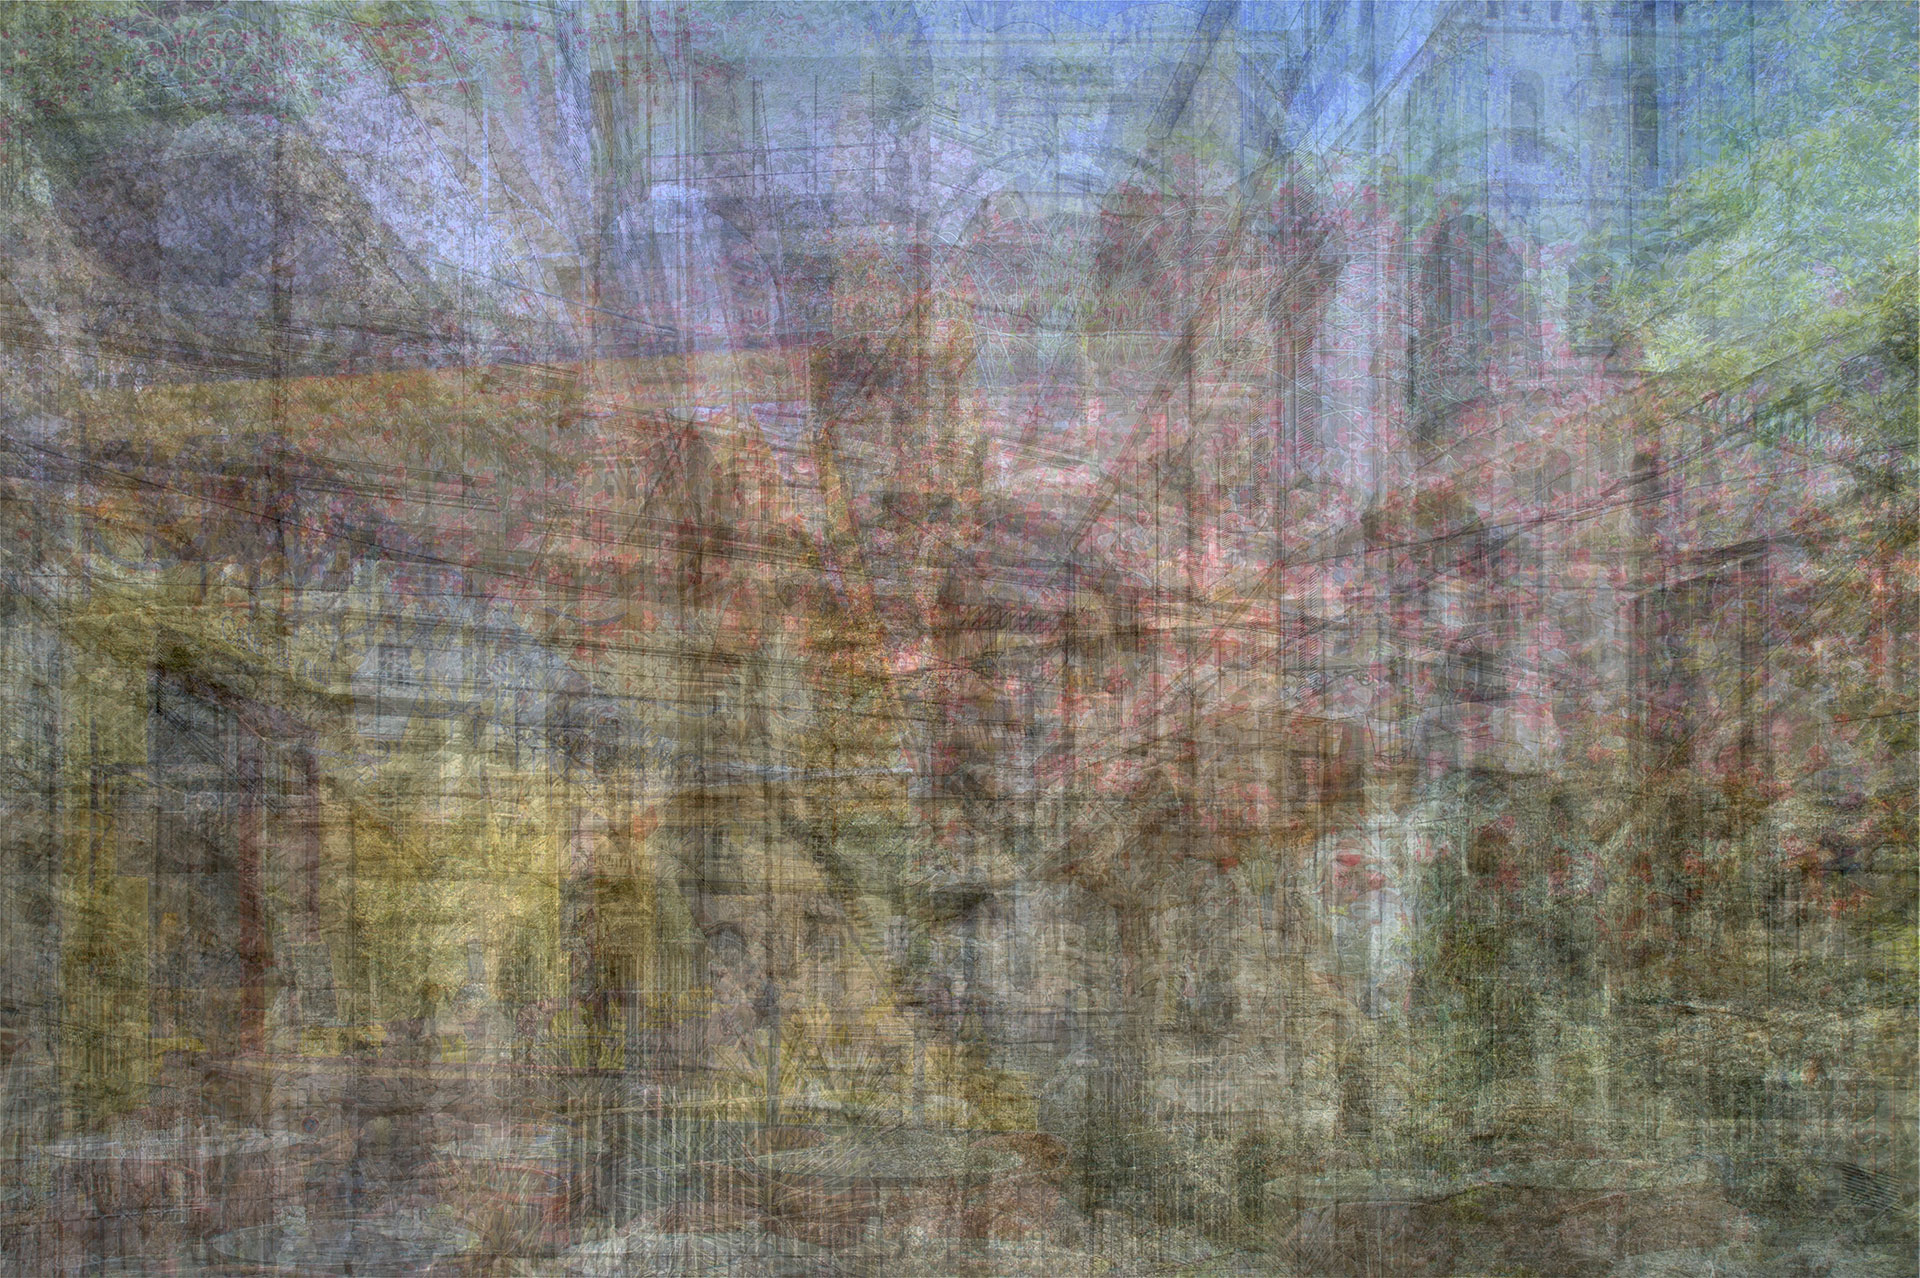 Arles | 100cm x 66cm | Inyección de tinta sobre aluminioUV Druck auf Aluminium